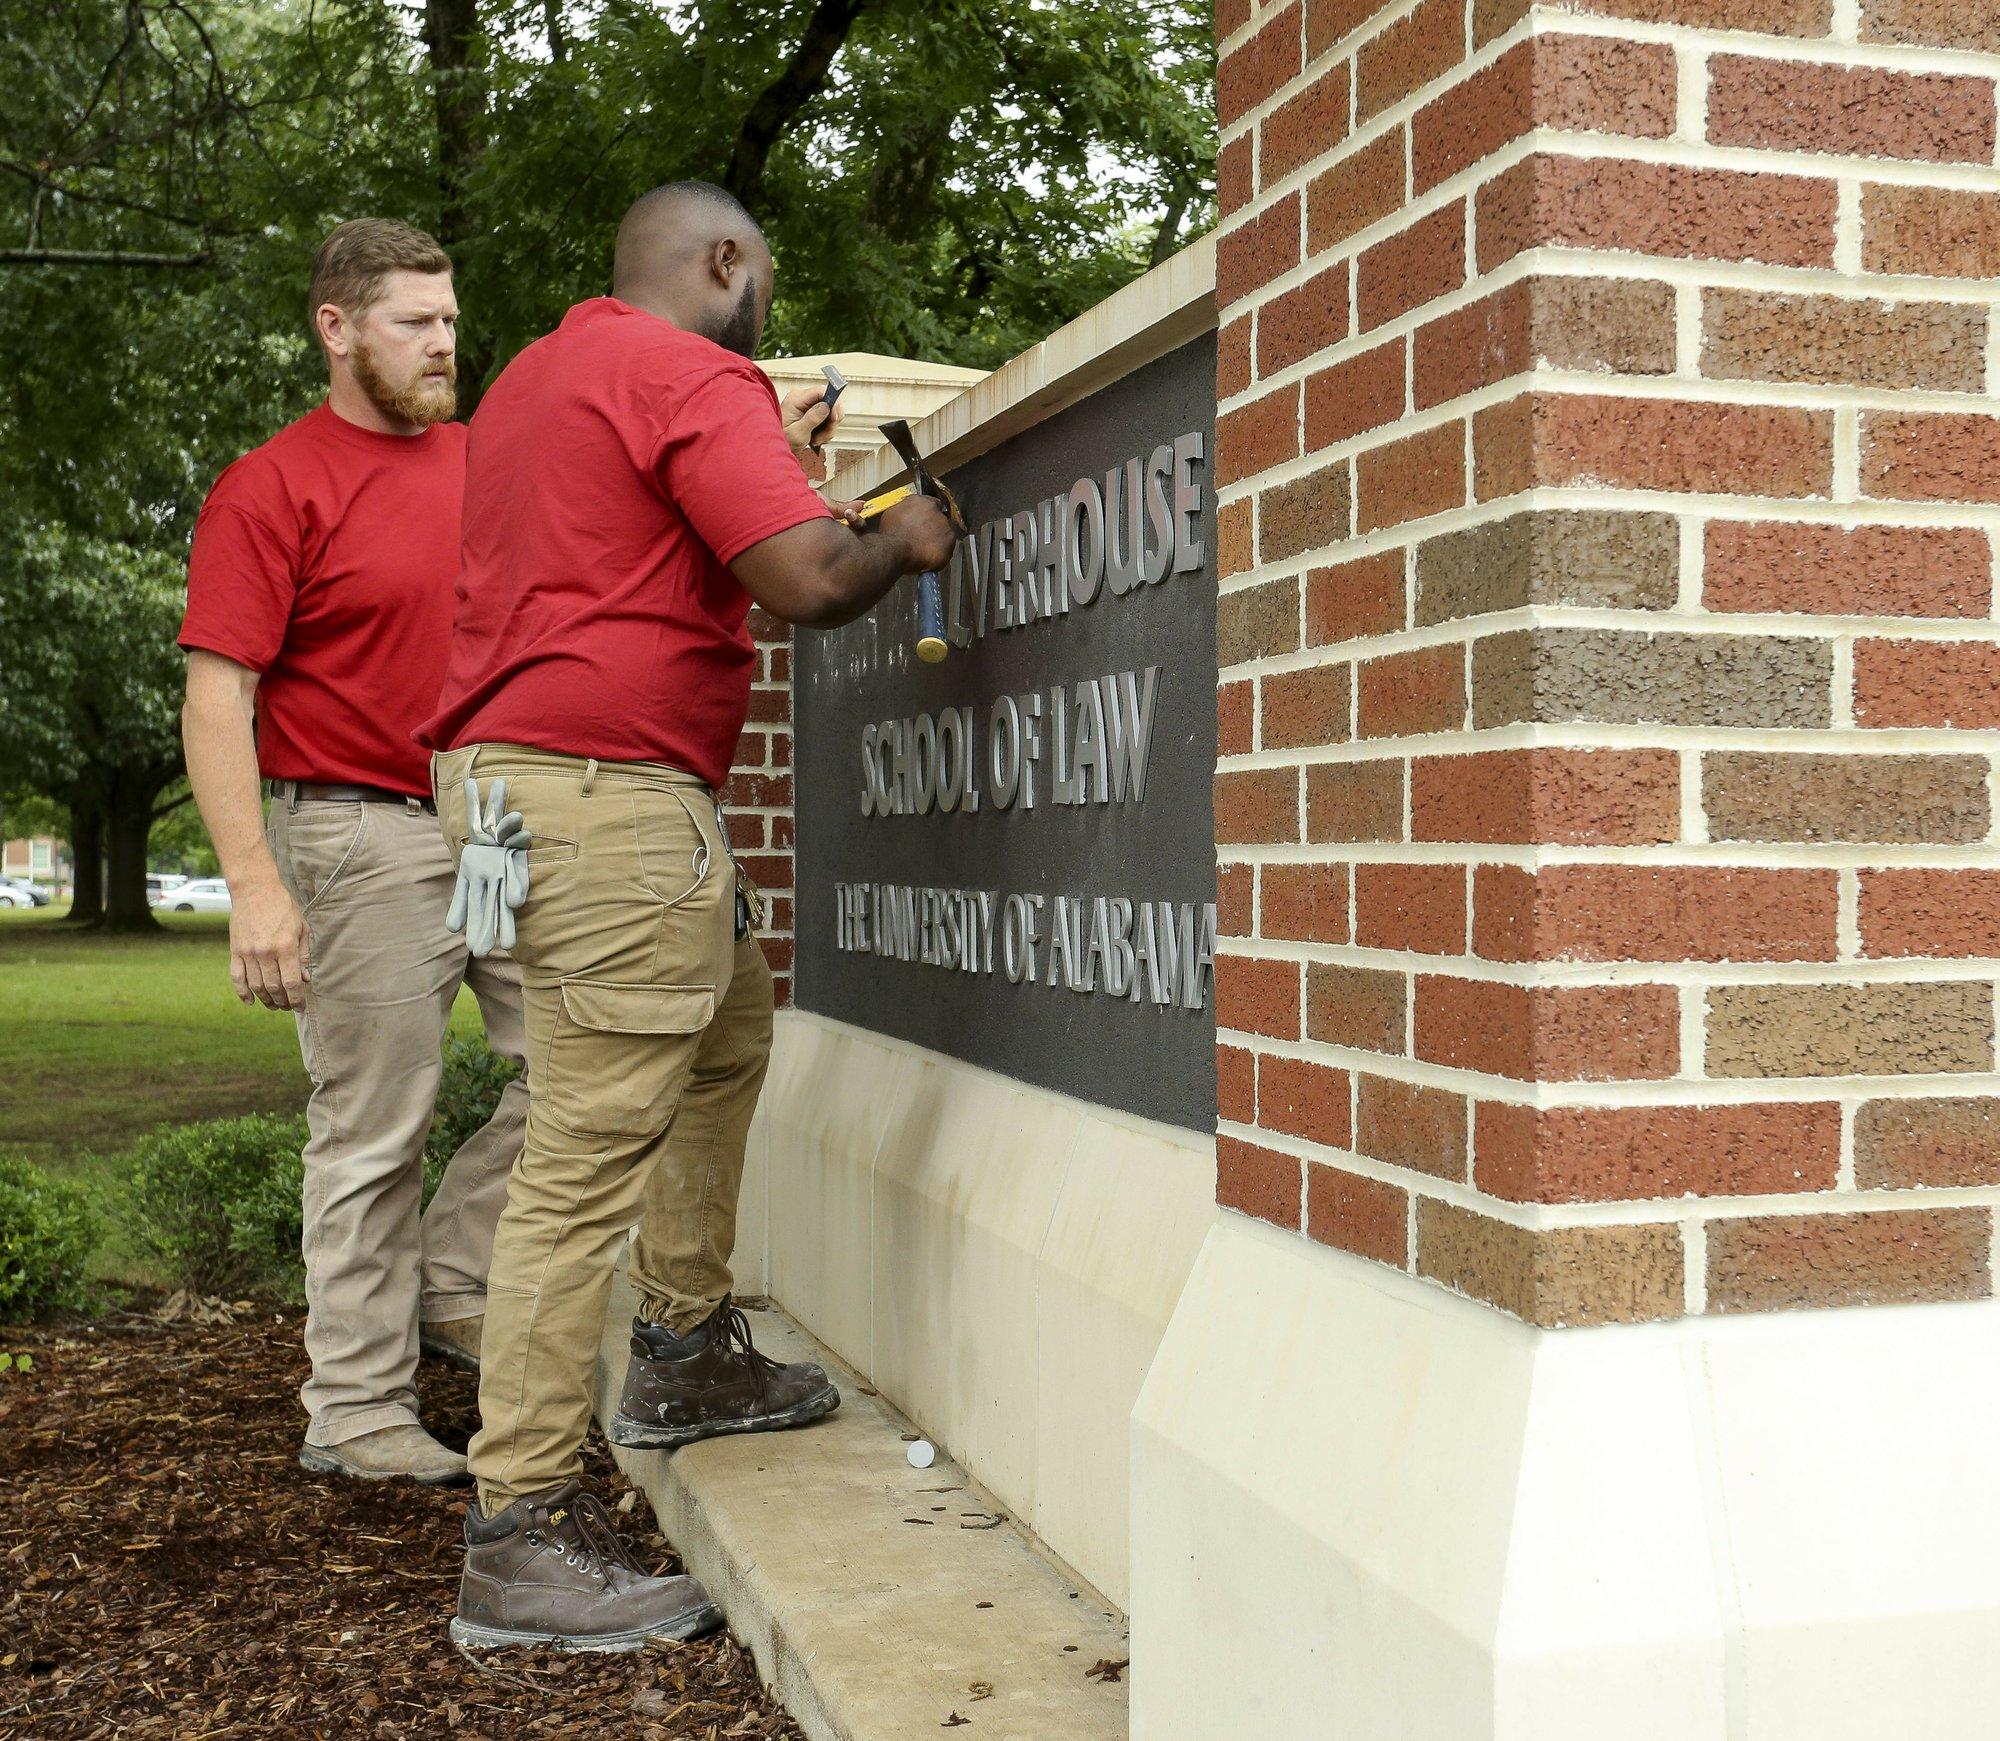 The Latest: Donor says university is punishing him